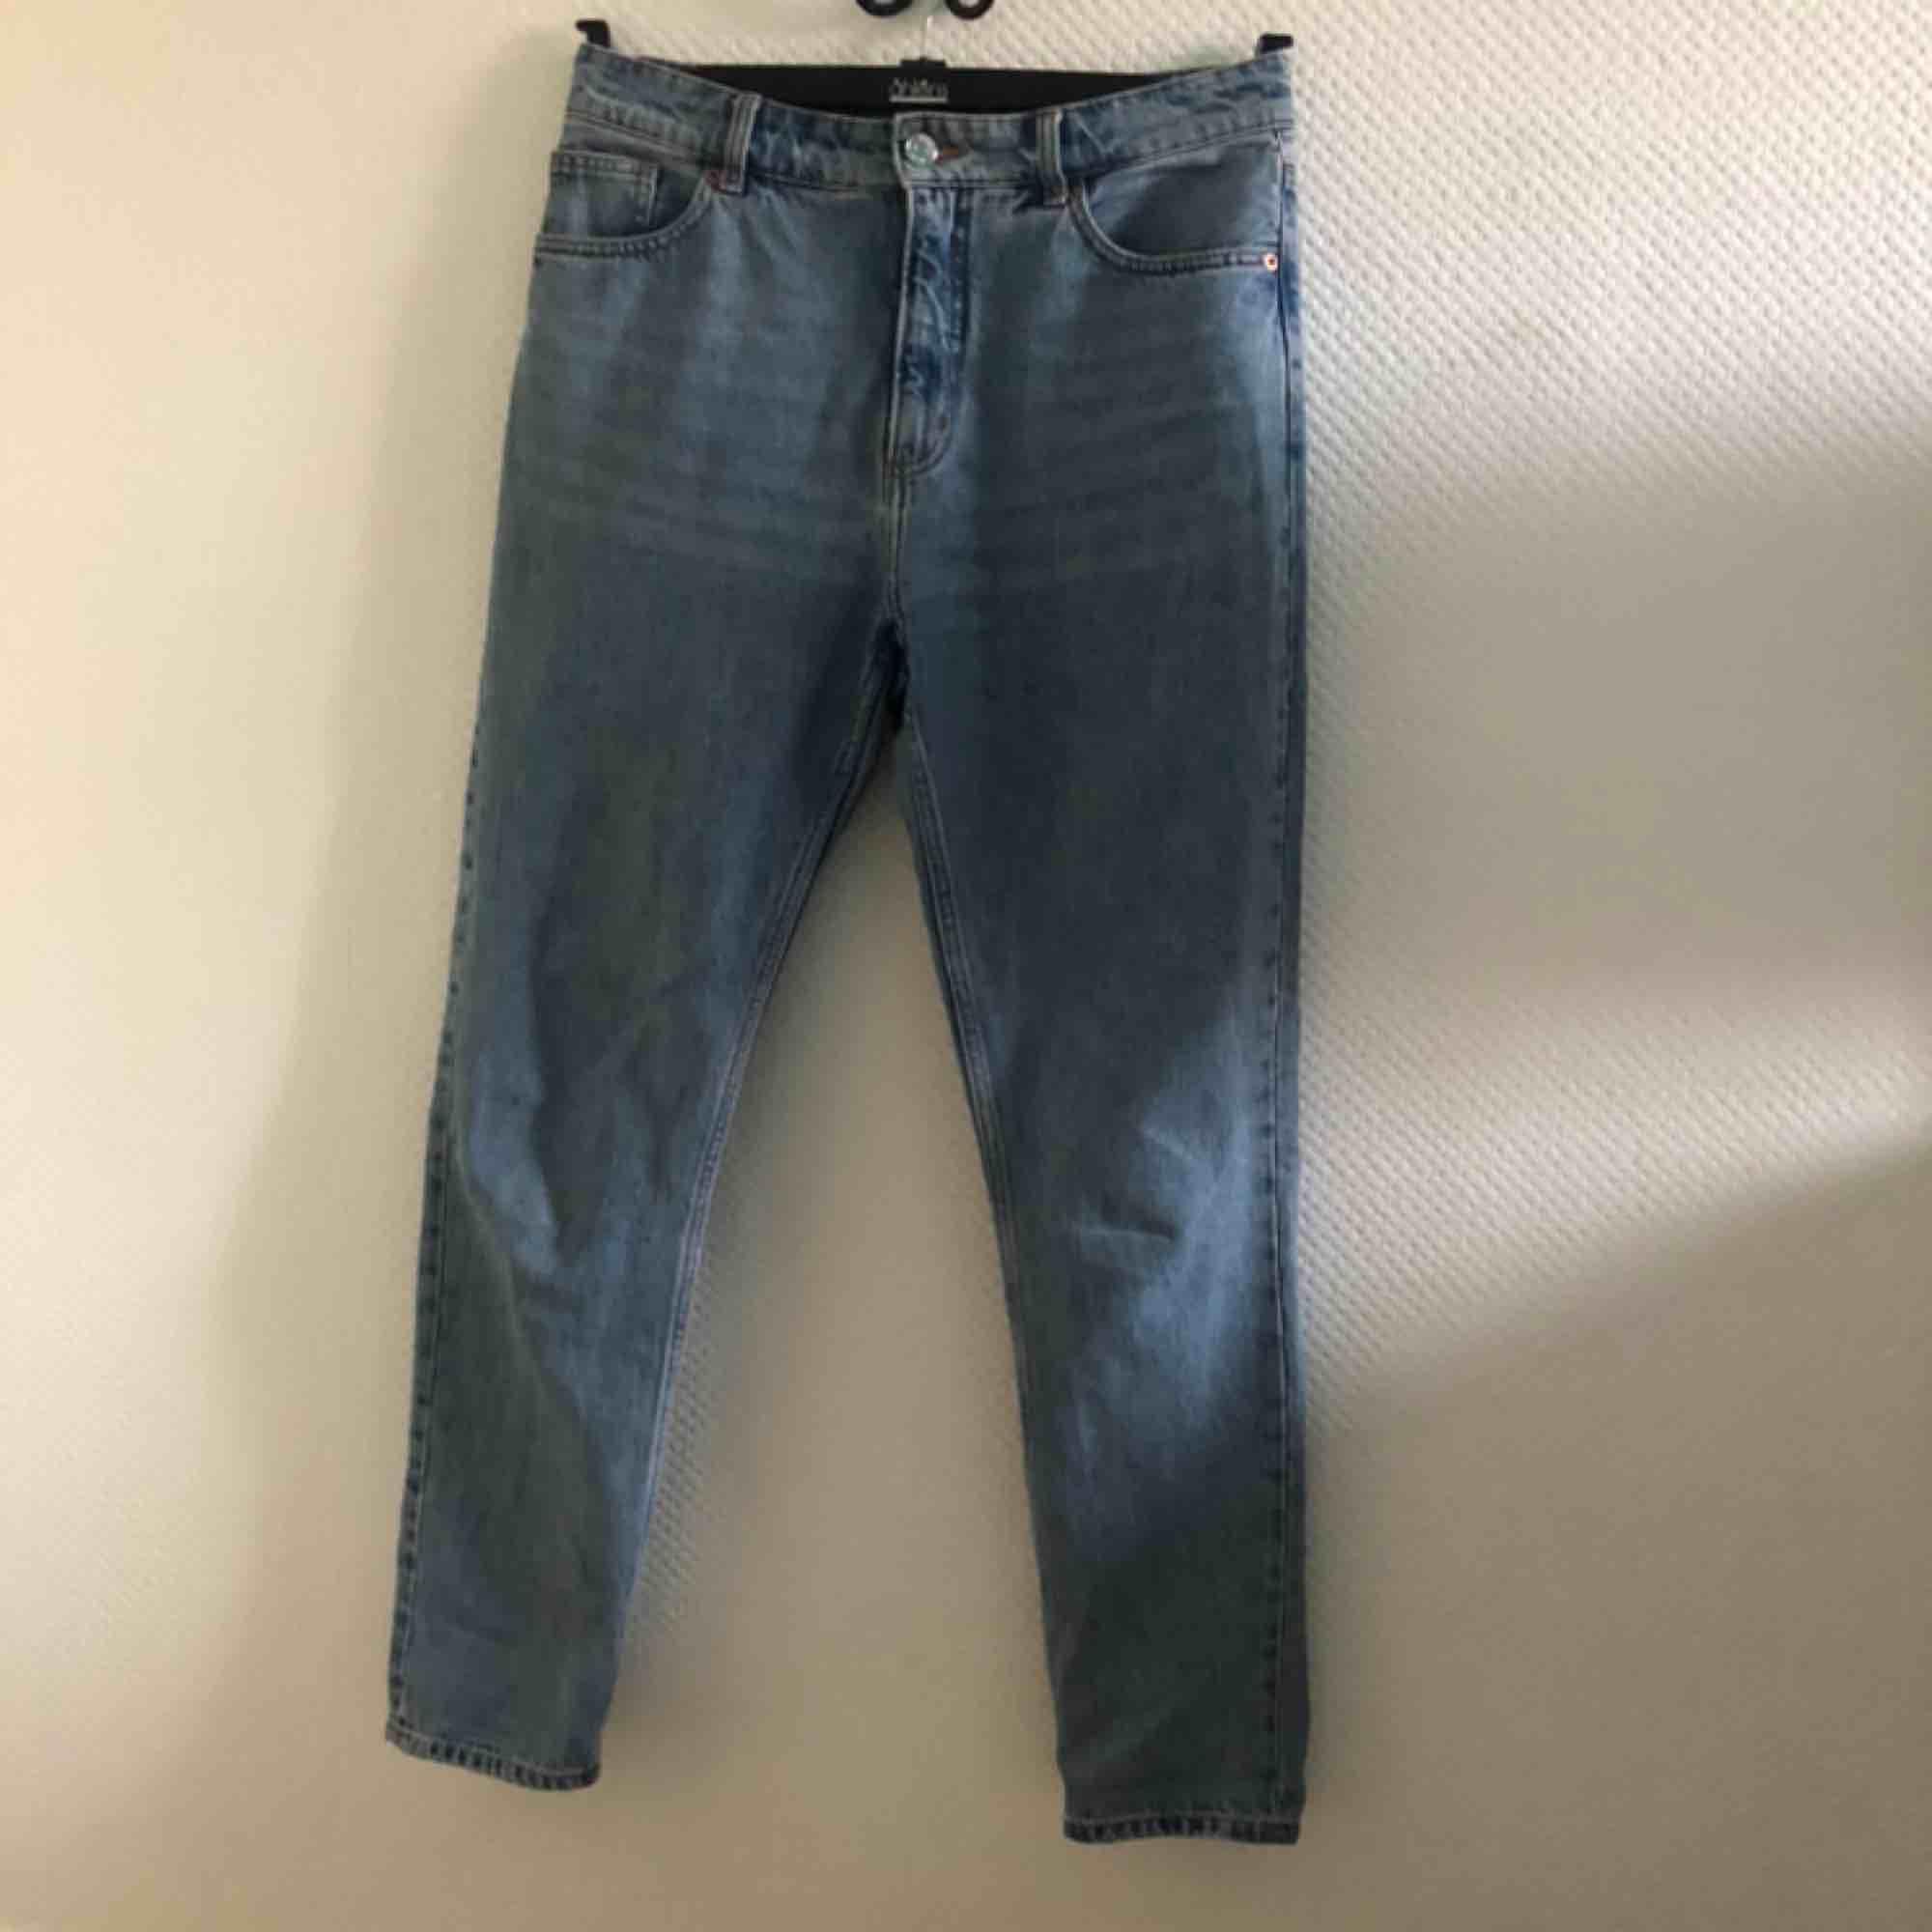 Blåa mom-jeans från Monki✨✨ Storlek W30 passar EU 38-40🌸. Jeans & Byxor.